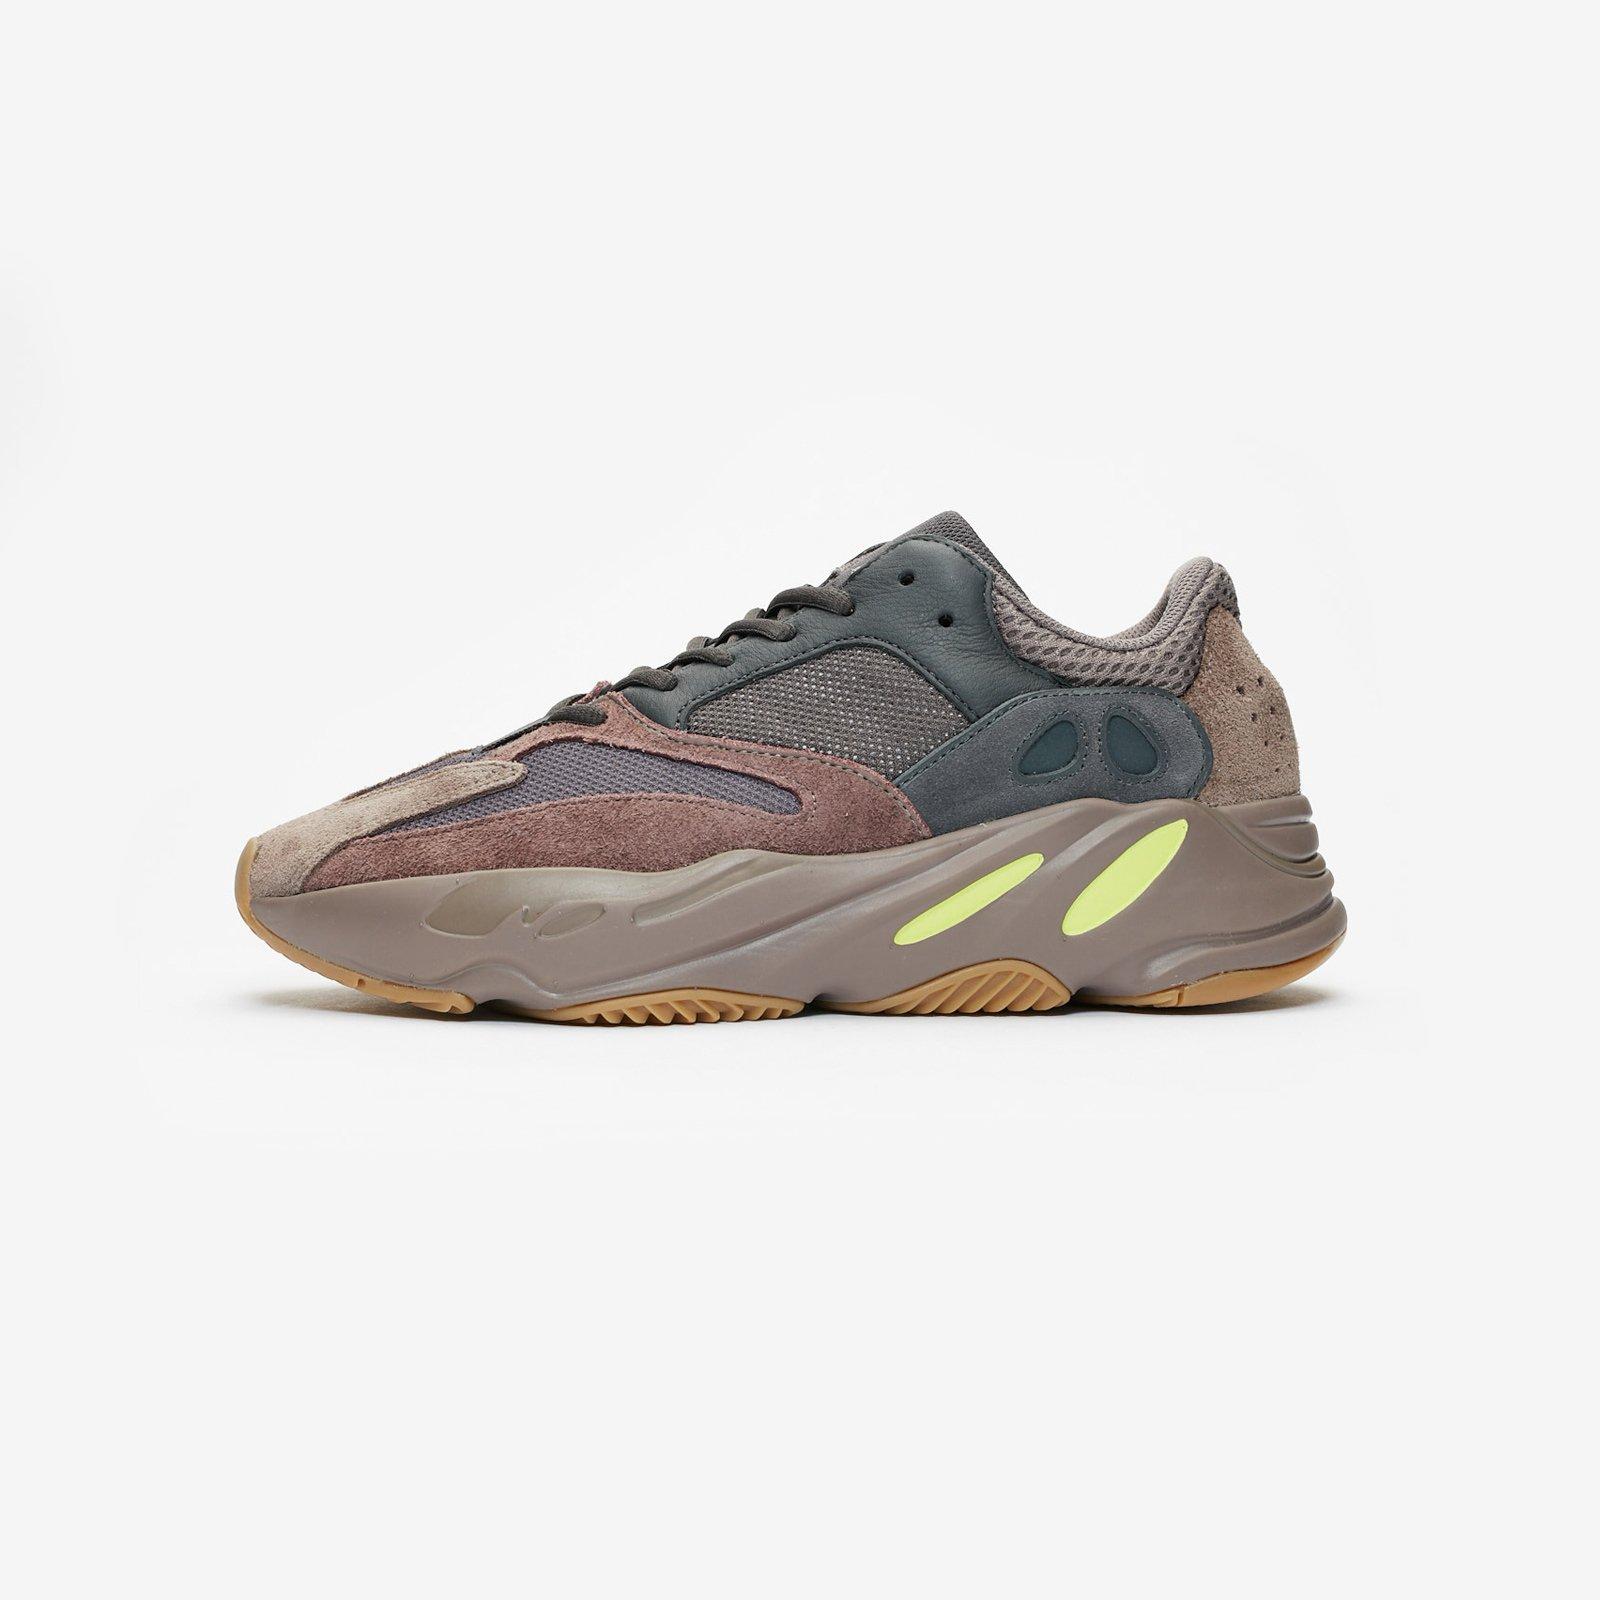 5caa3b1a28e8a adidas YEEZY BOOST 700 - Ee9614 - Sneakersnstuff